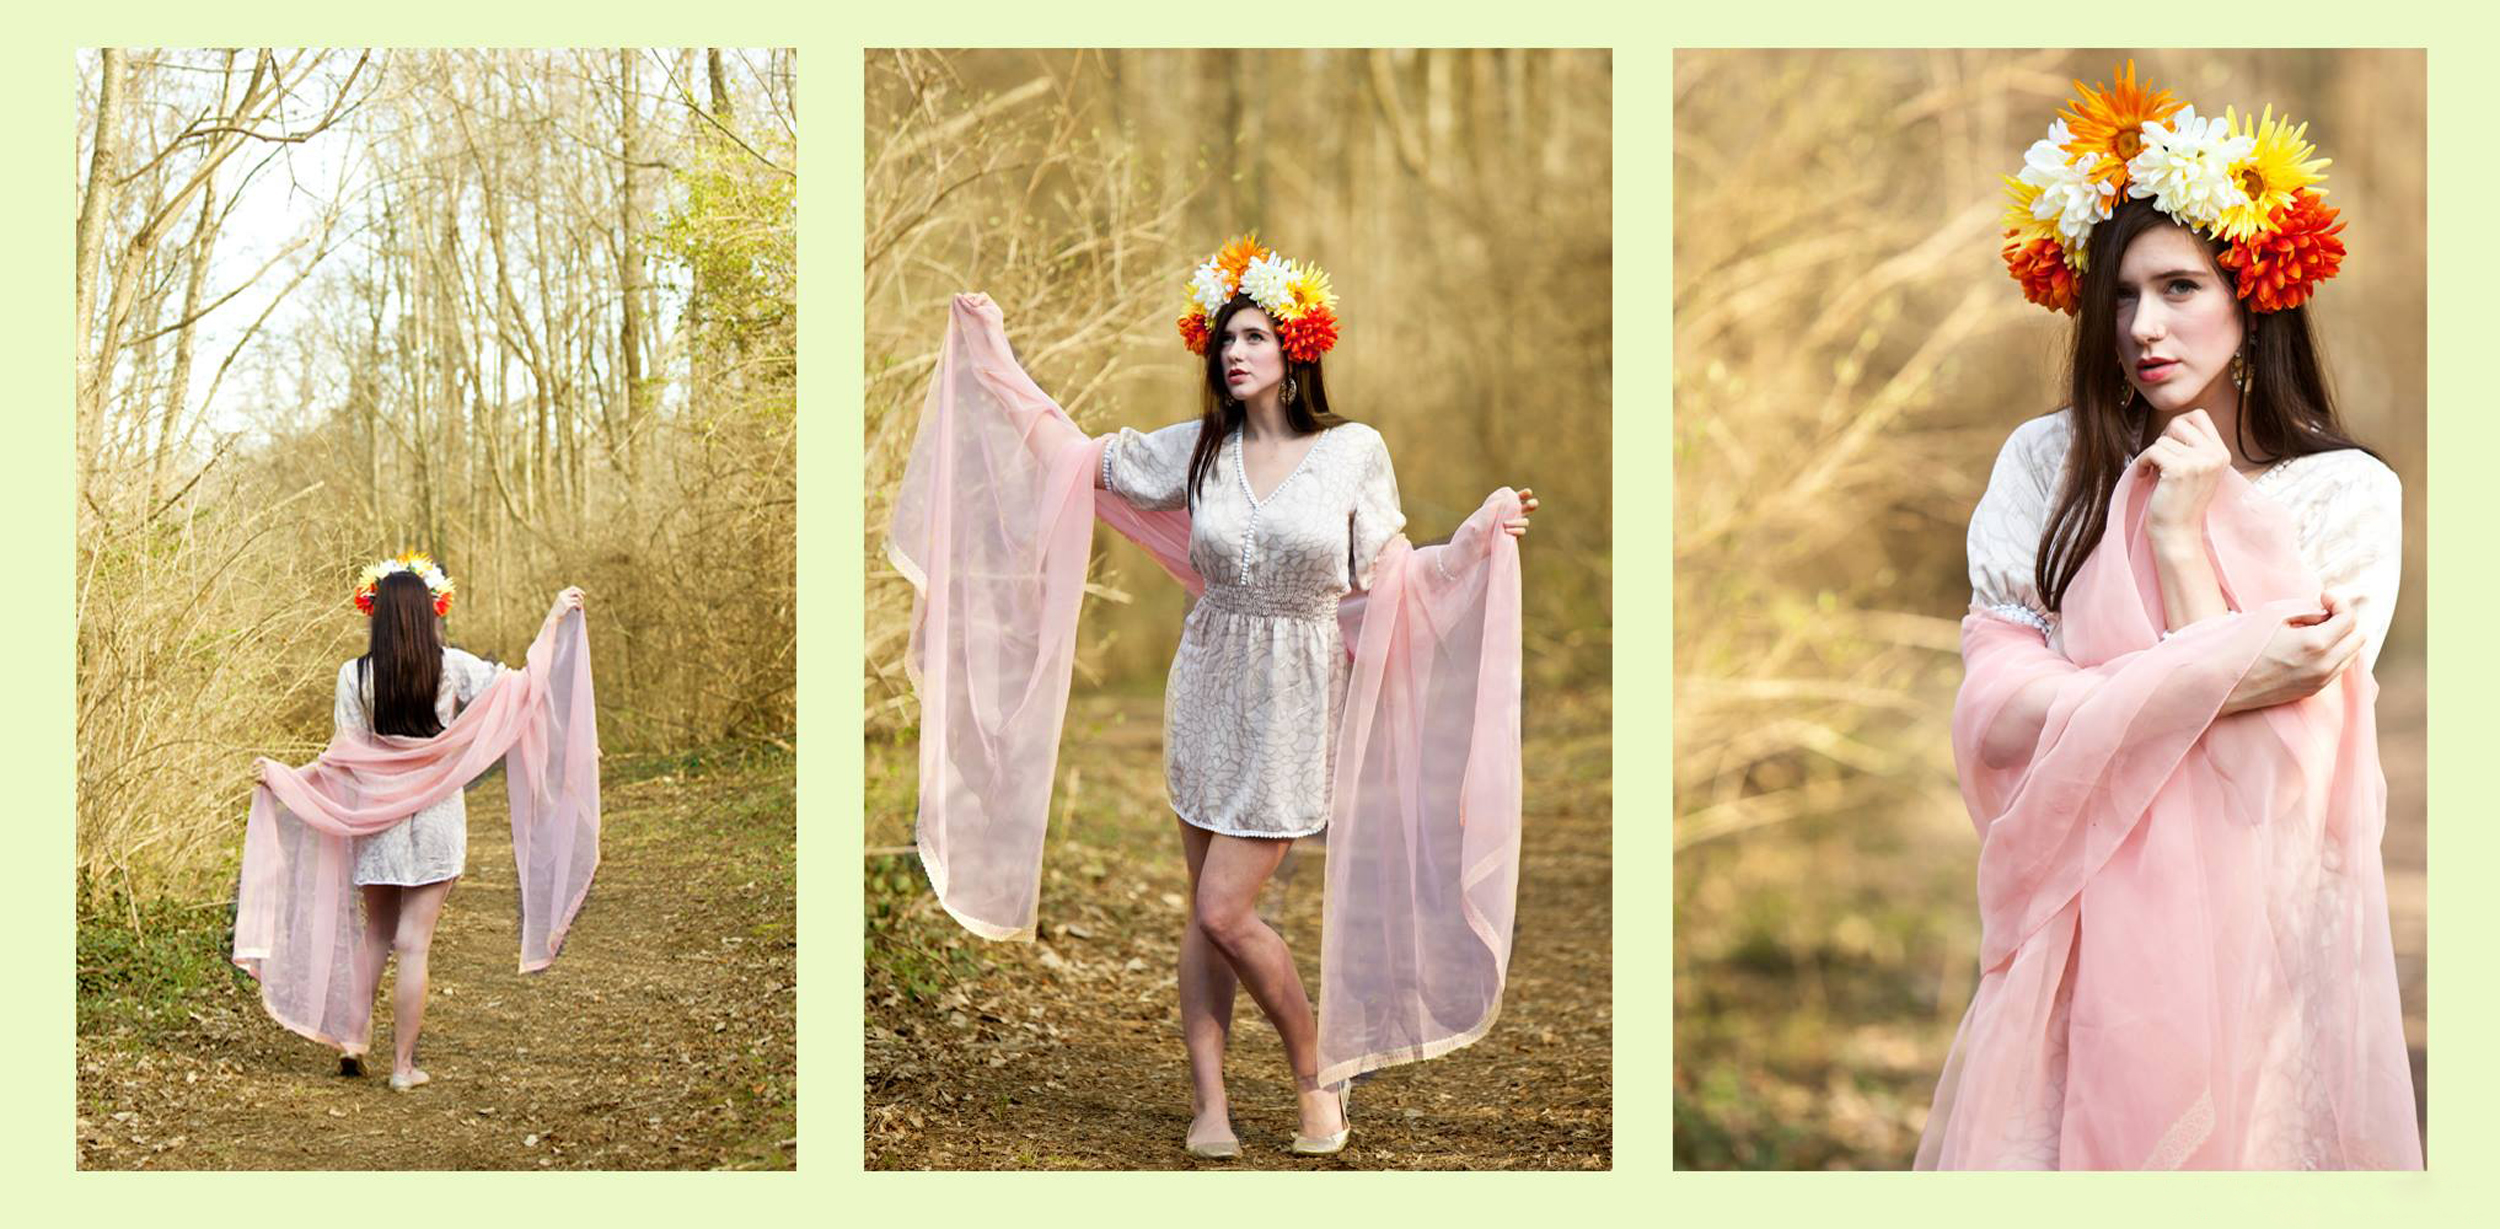 bria triptych.jpg